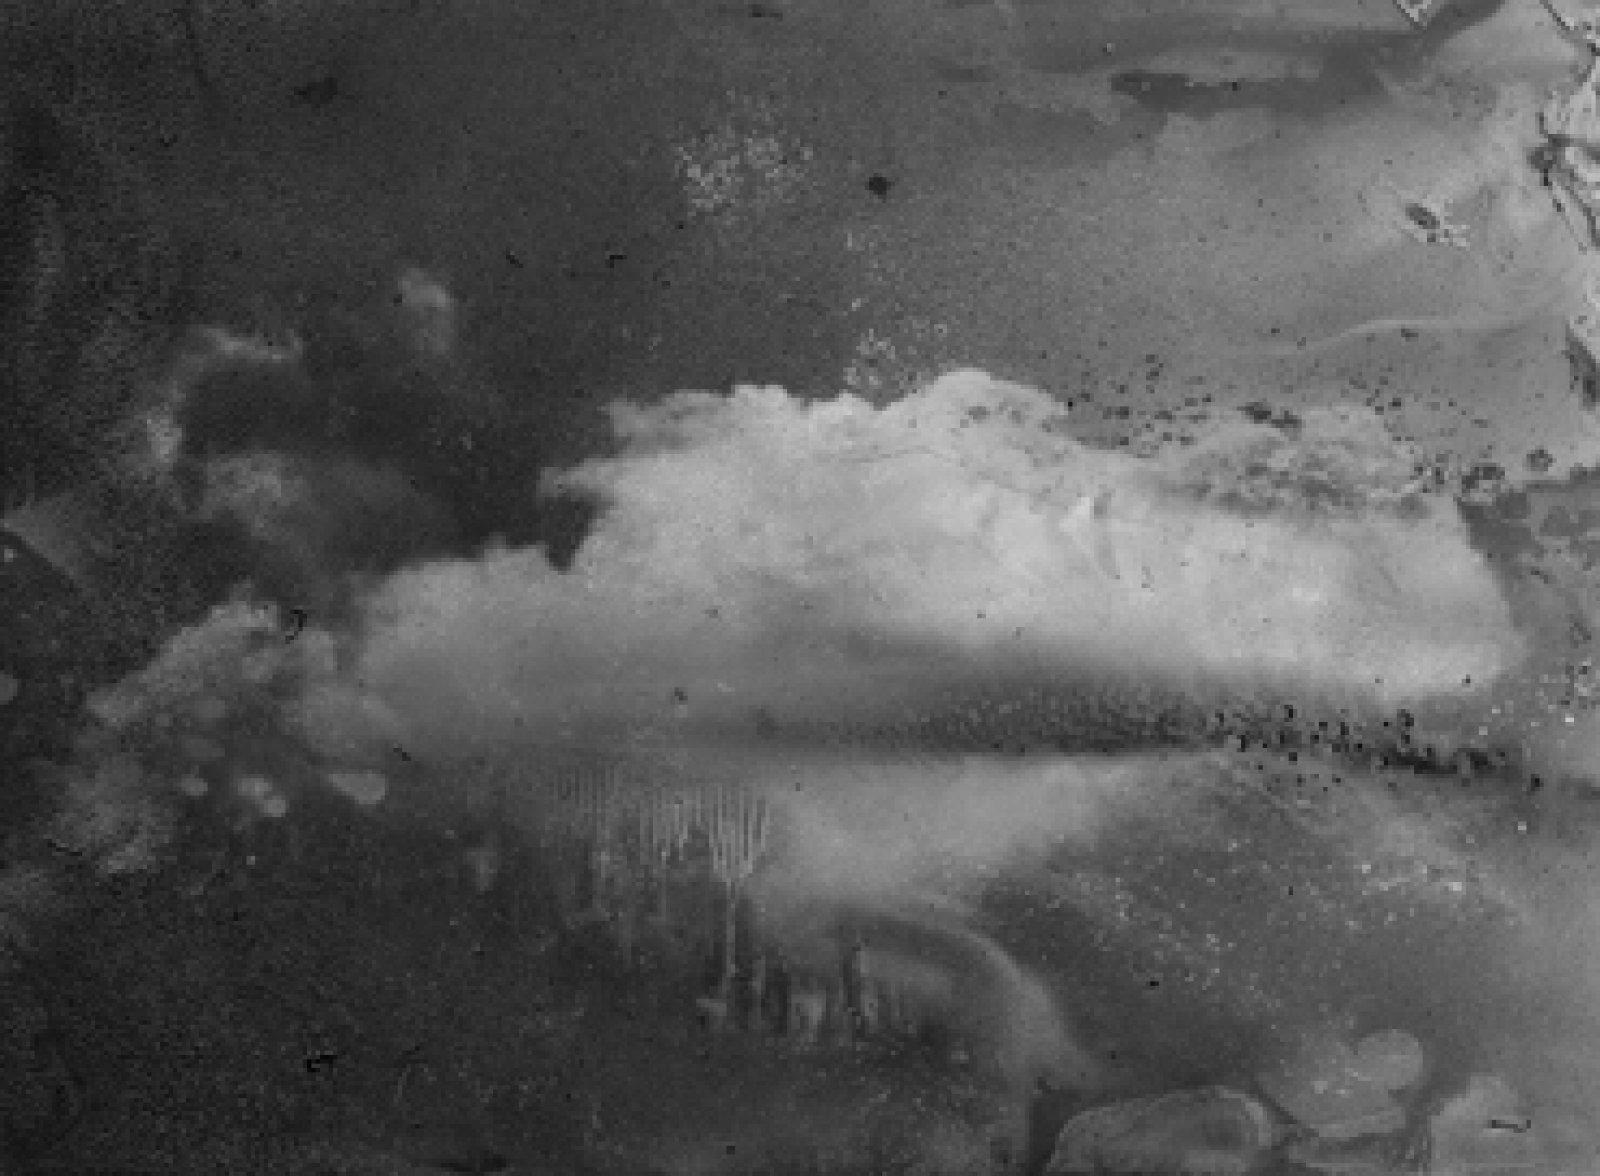 Cloud, from the series site/cloud, 2013 © Daisuke Yokota / courtesy of G/P gallery